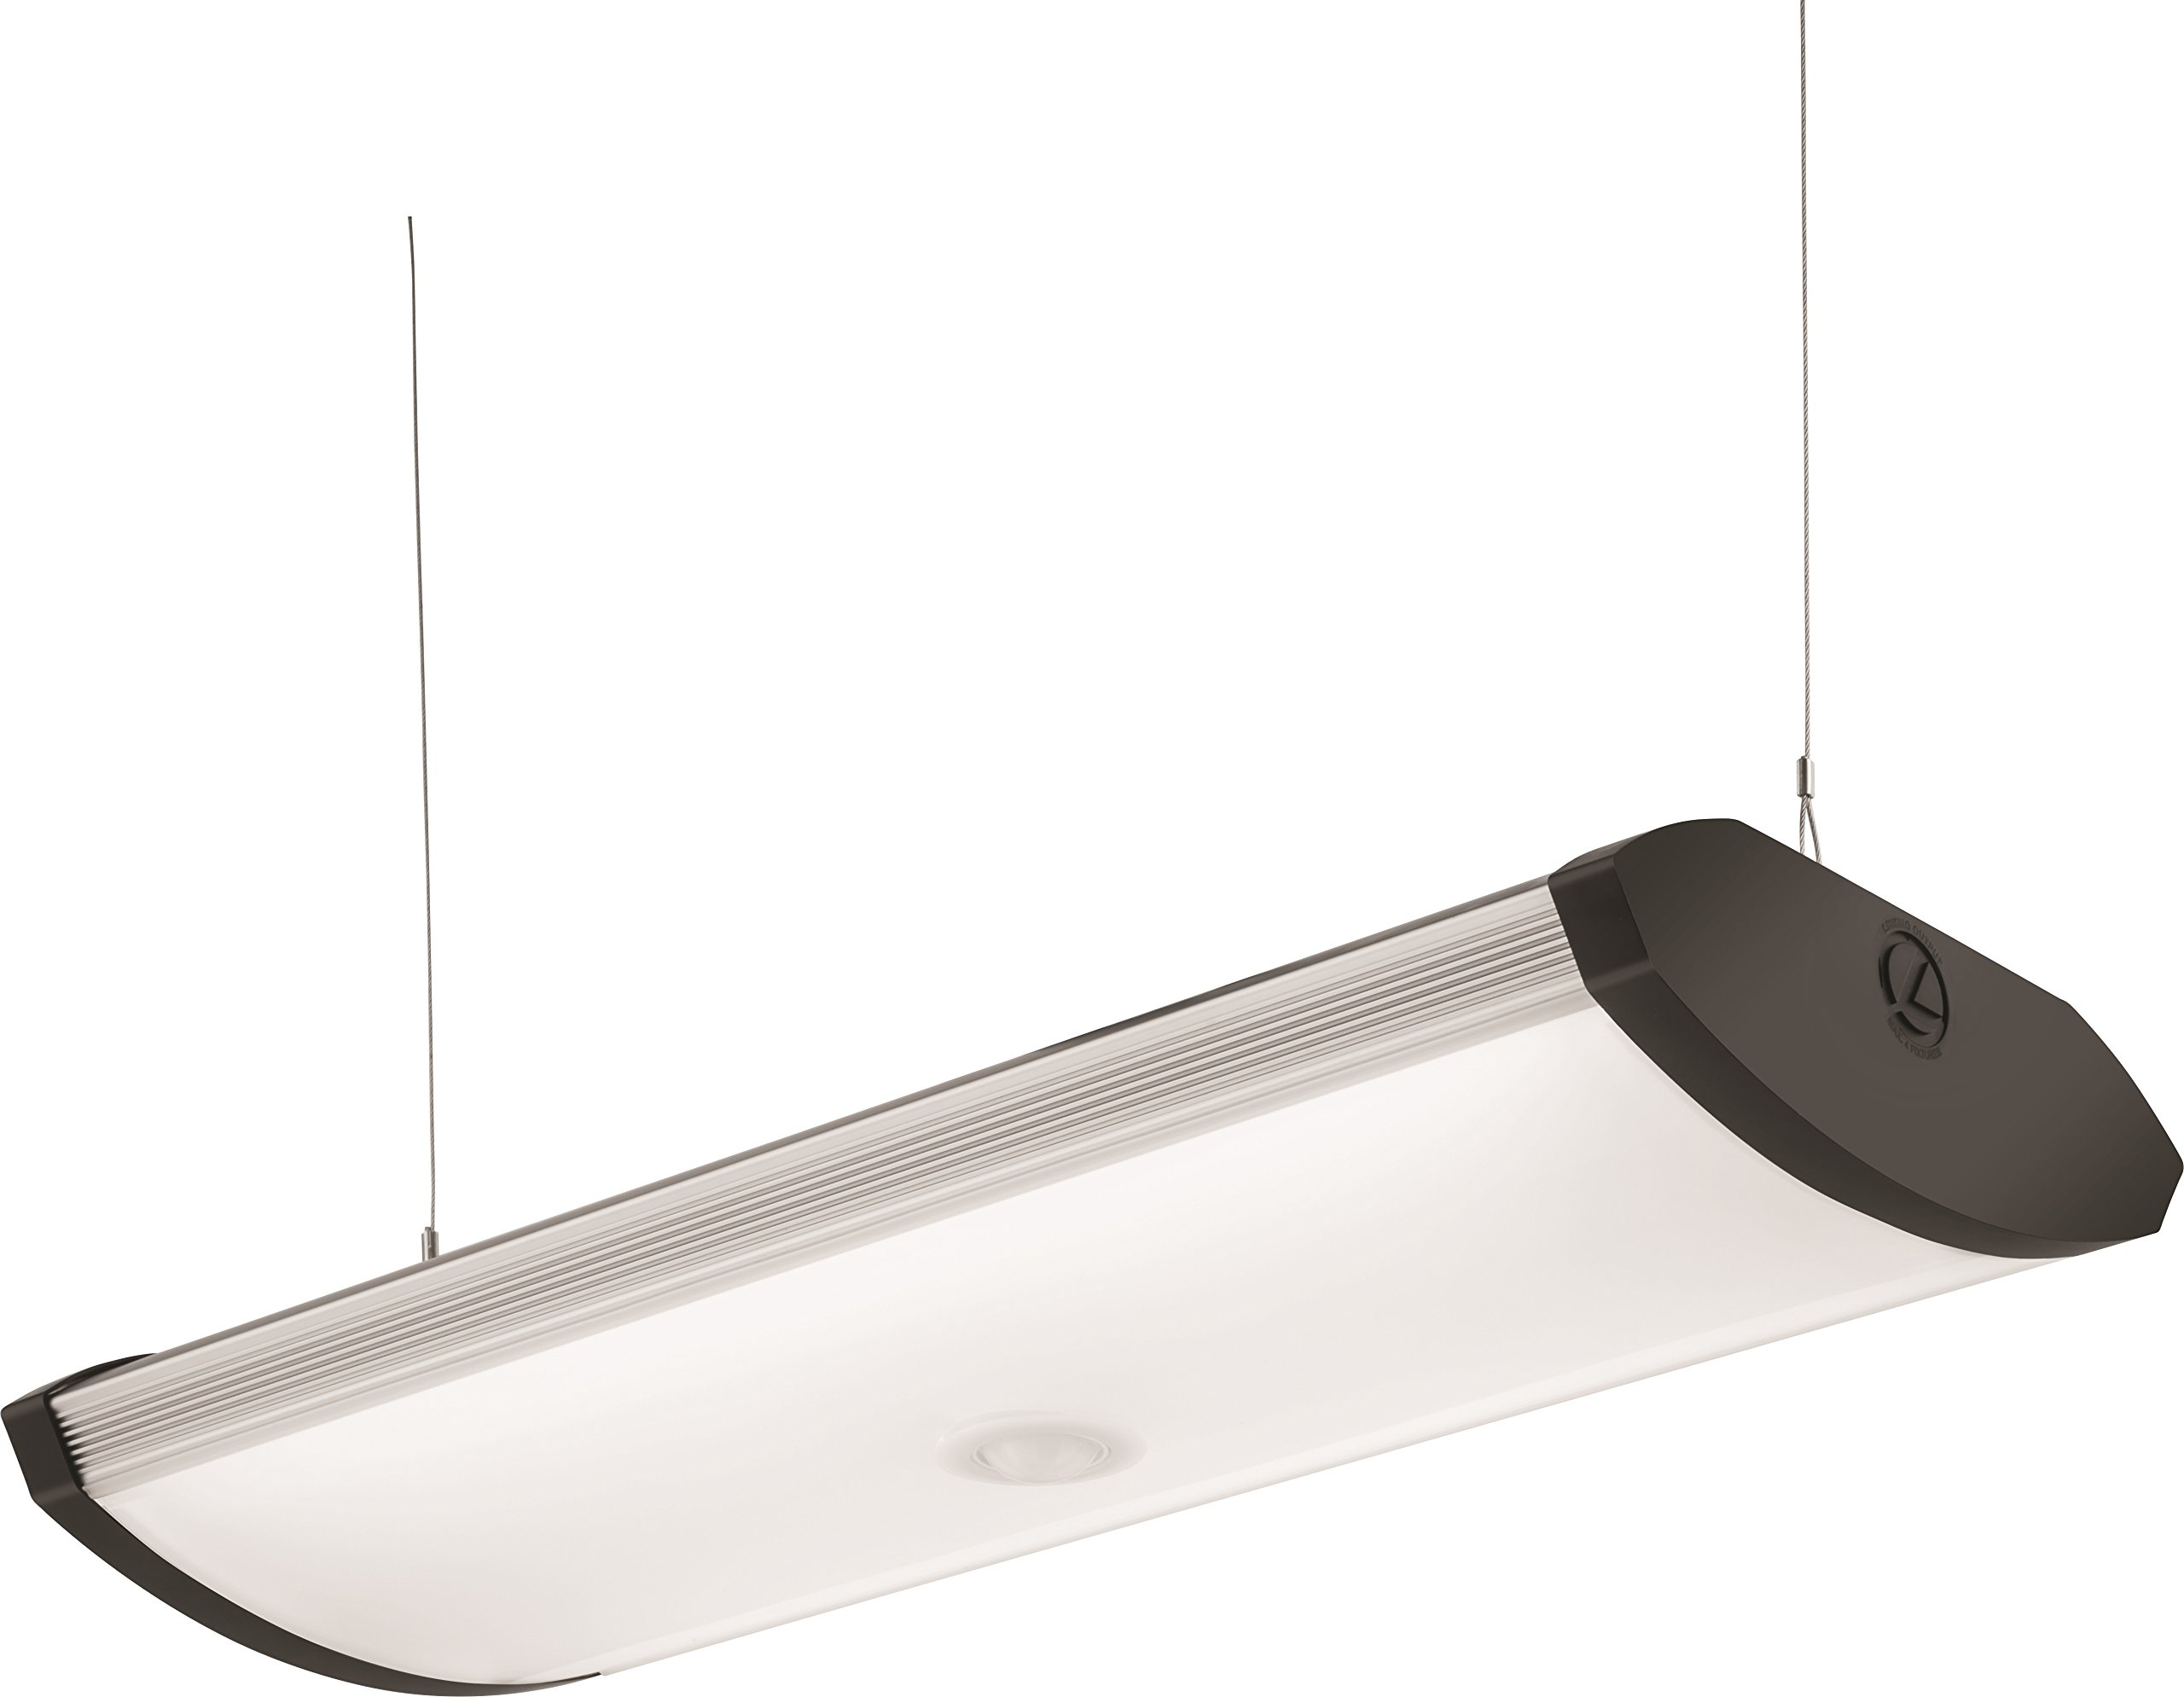 Lithonia Lighting SGLL 24 40K 80CRI PIR M4 LED Garage Light with Motion Sensor